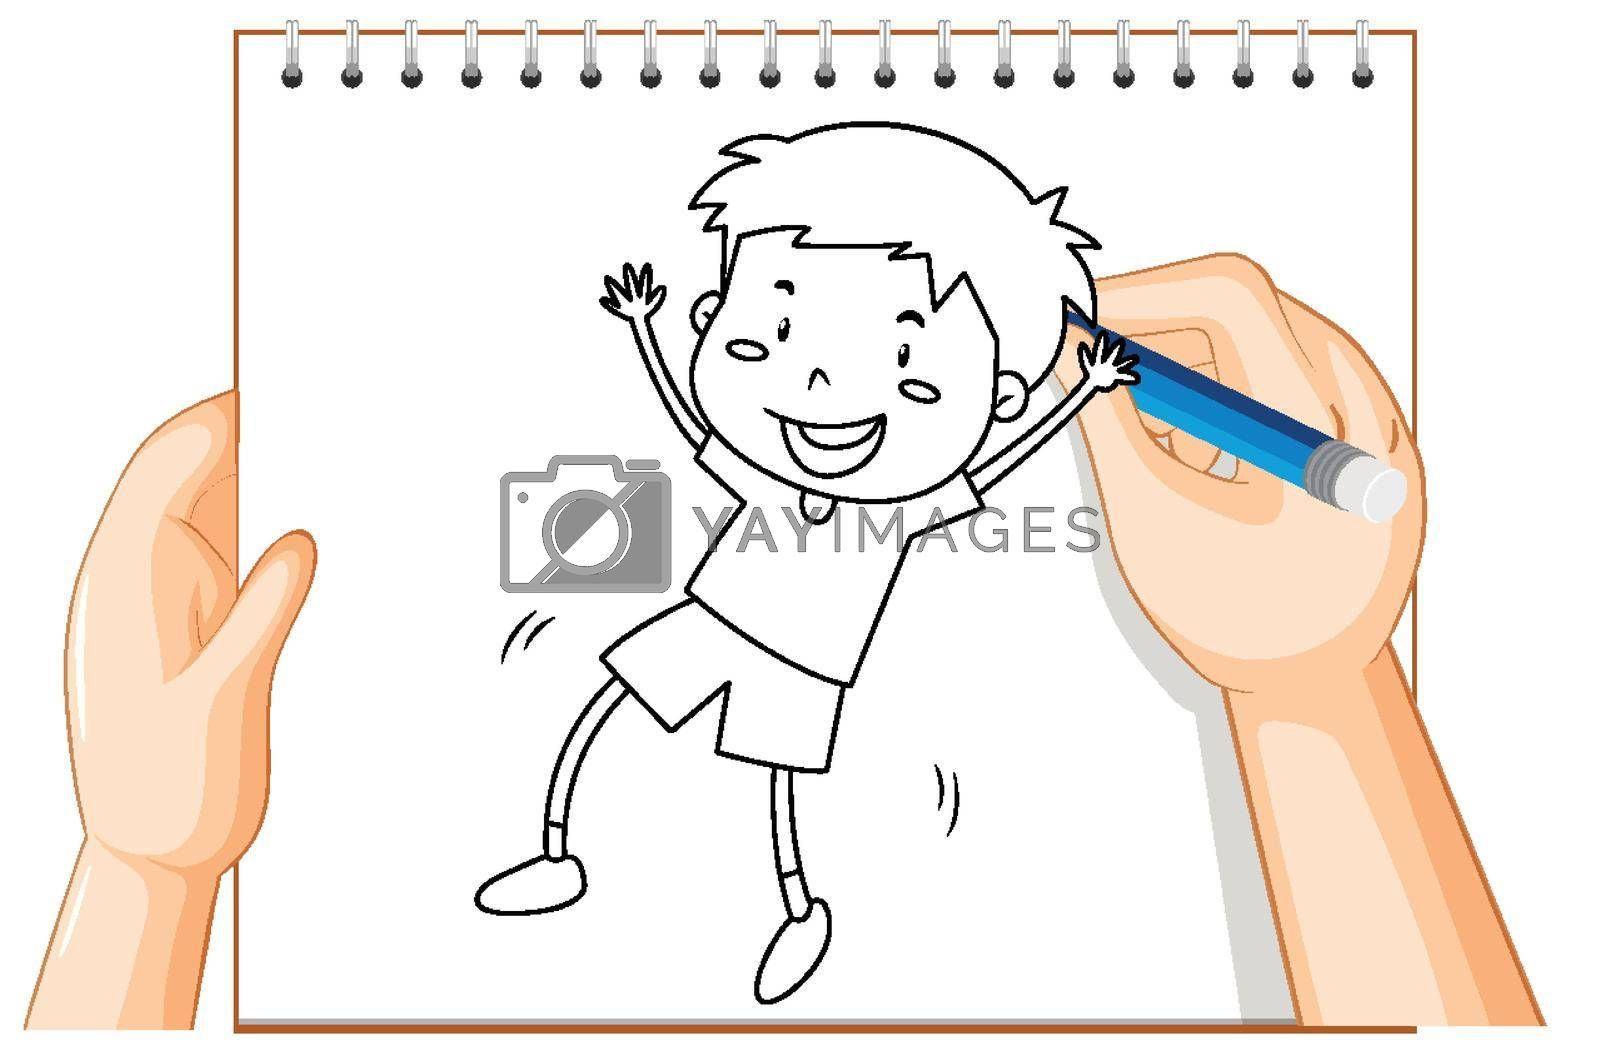 Hand writing of boy dancing outline illustration